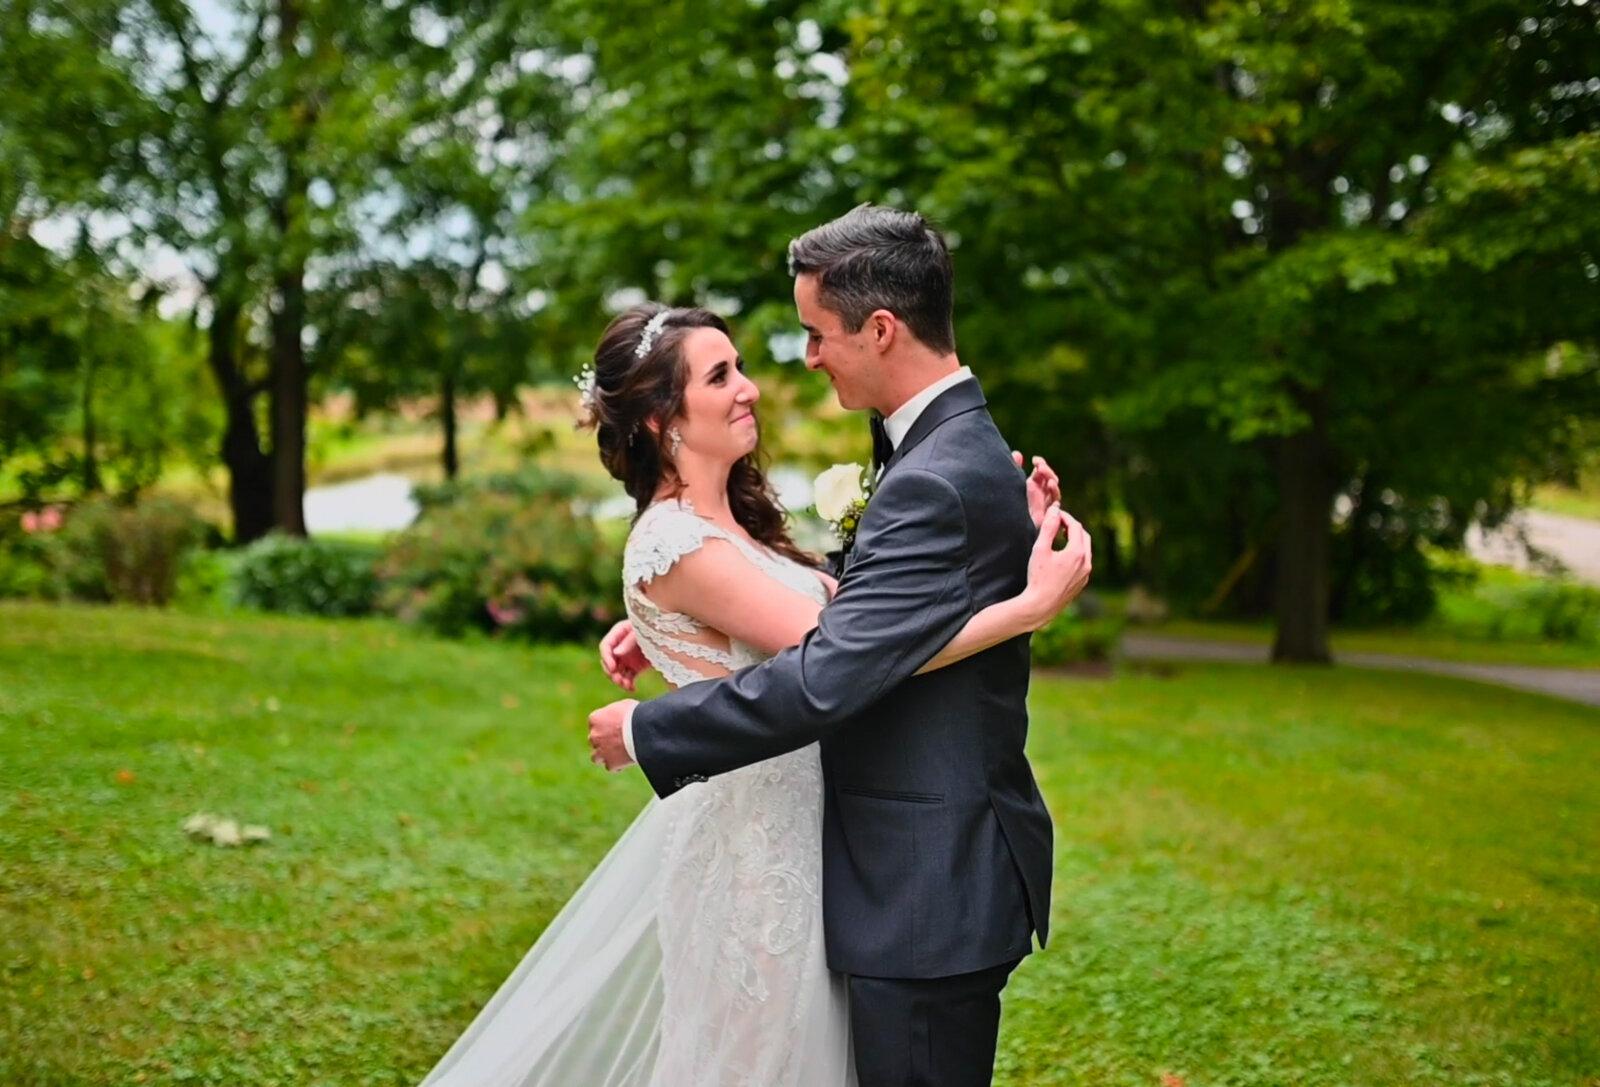 Ben & Bec's Wedding - Film Stills - Web-30.jpg